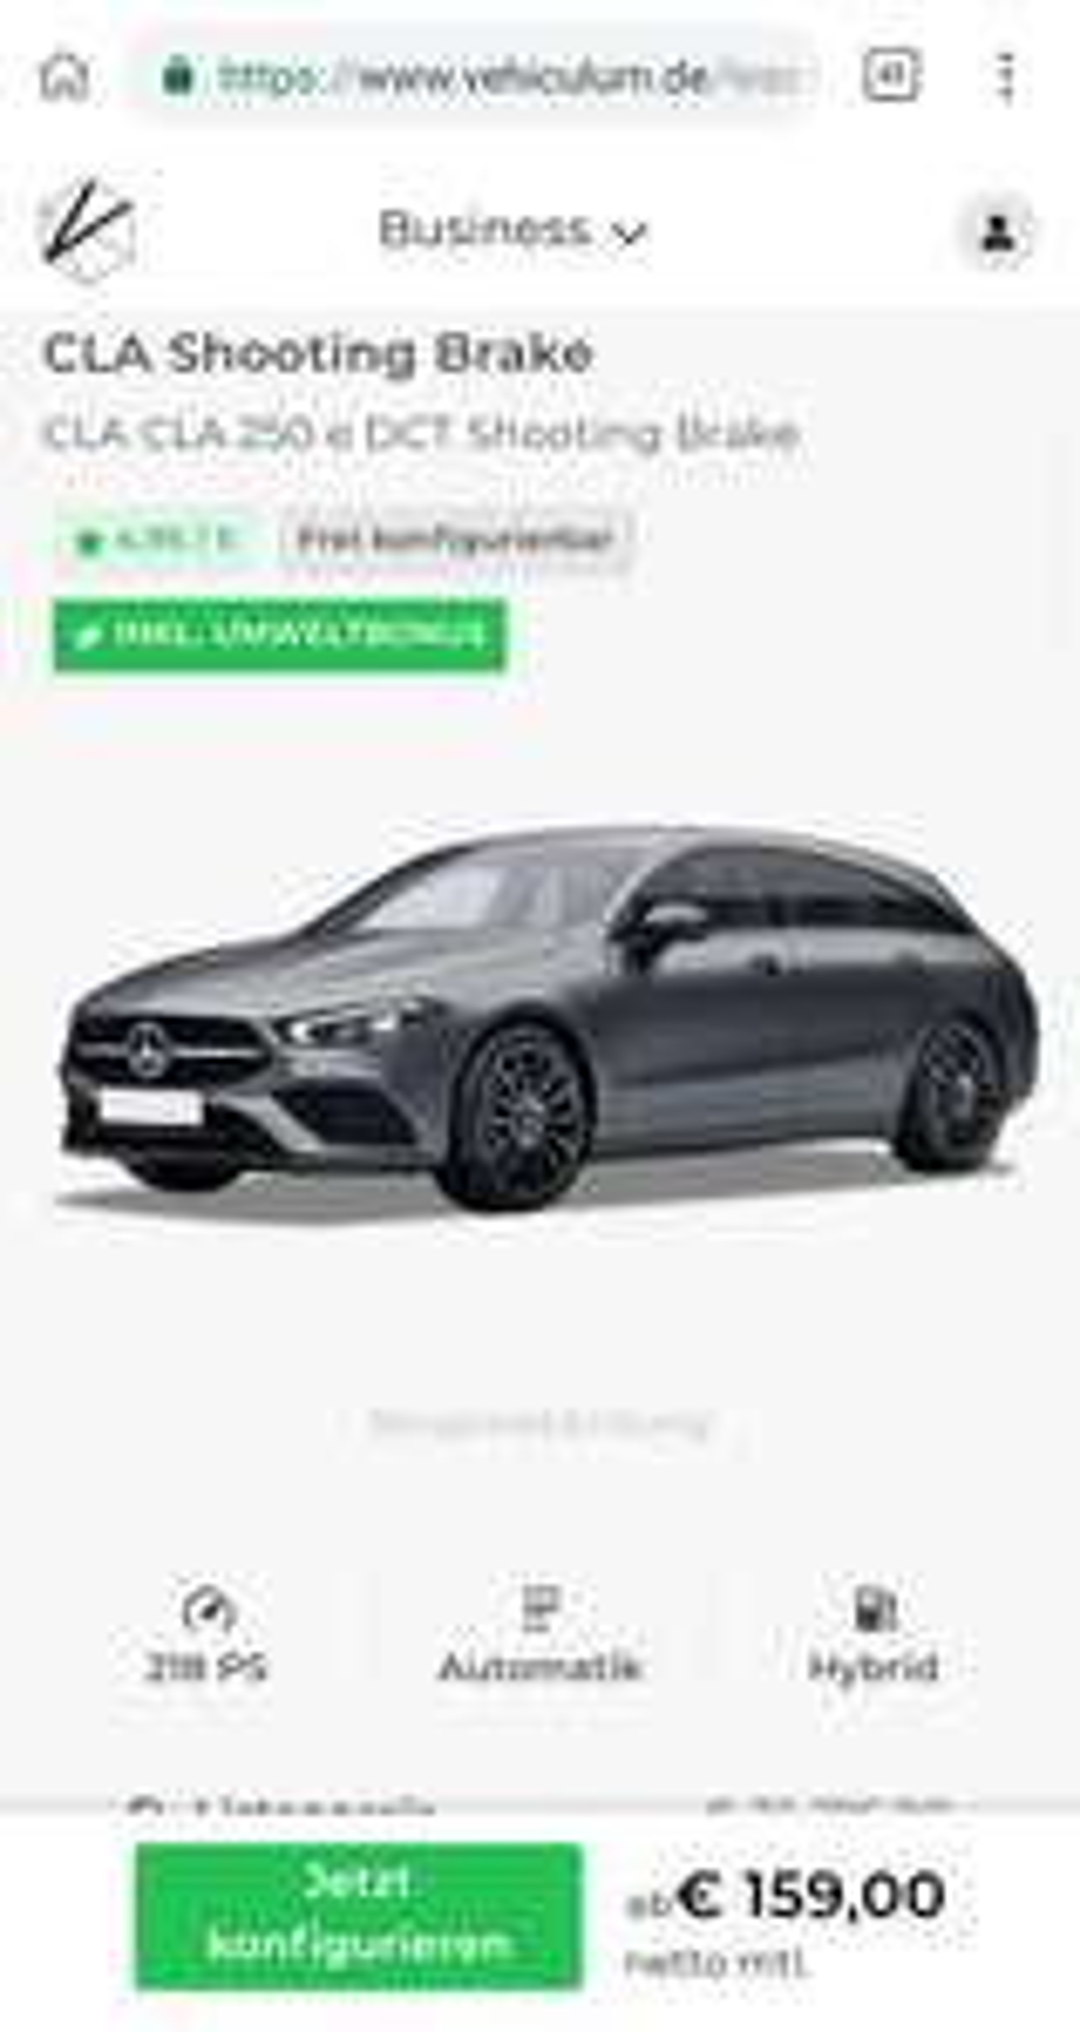 [Gewerbe-Leasing] Mercedes CLA Shootingbrake Hybrid - CLA 250 e DCT (218 PS) - ab mtl. 159€ Netto - konfigurierbar